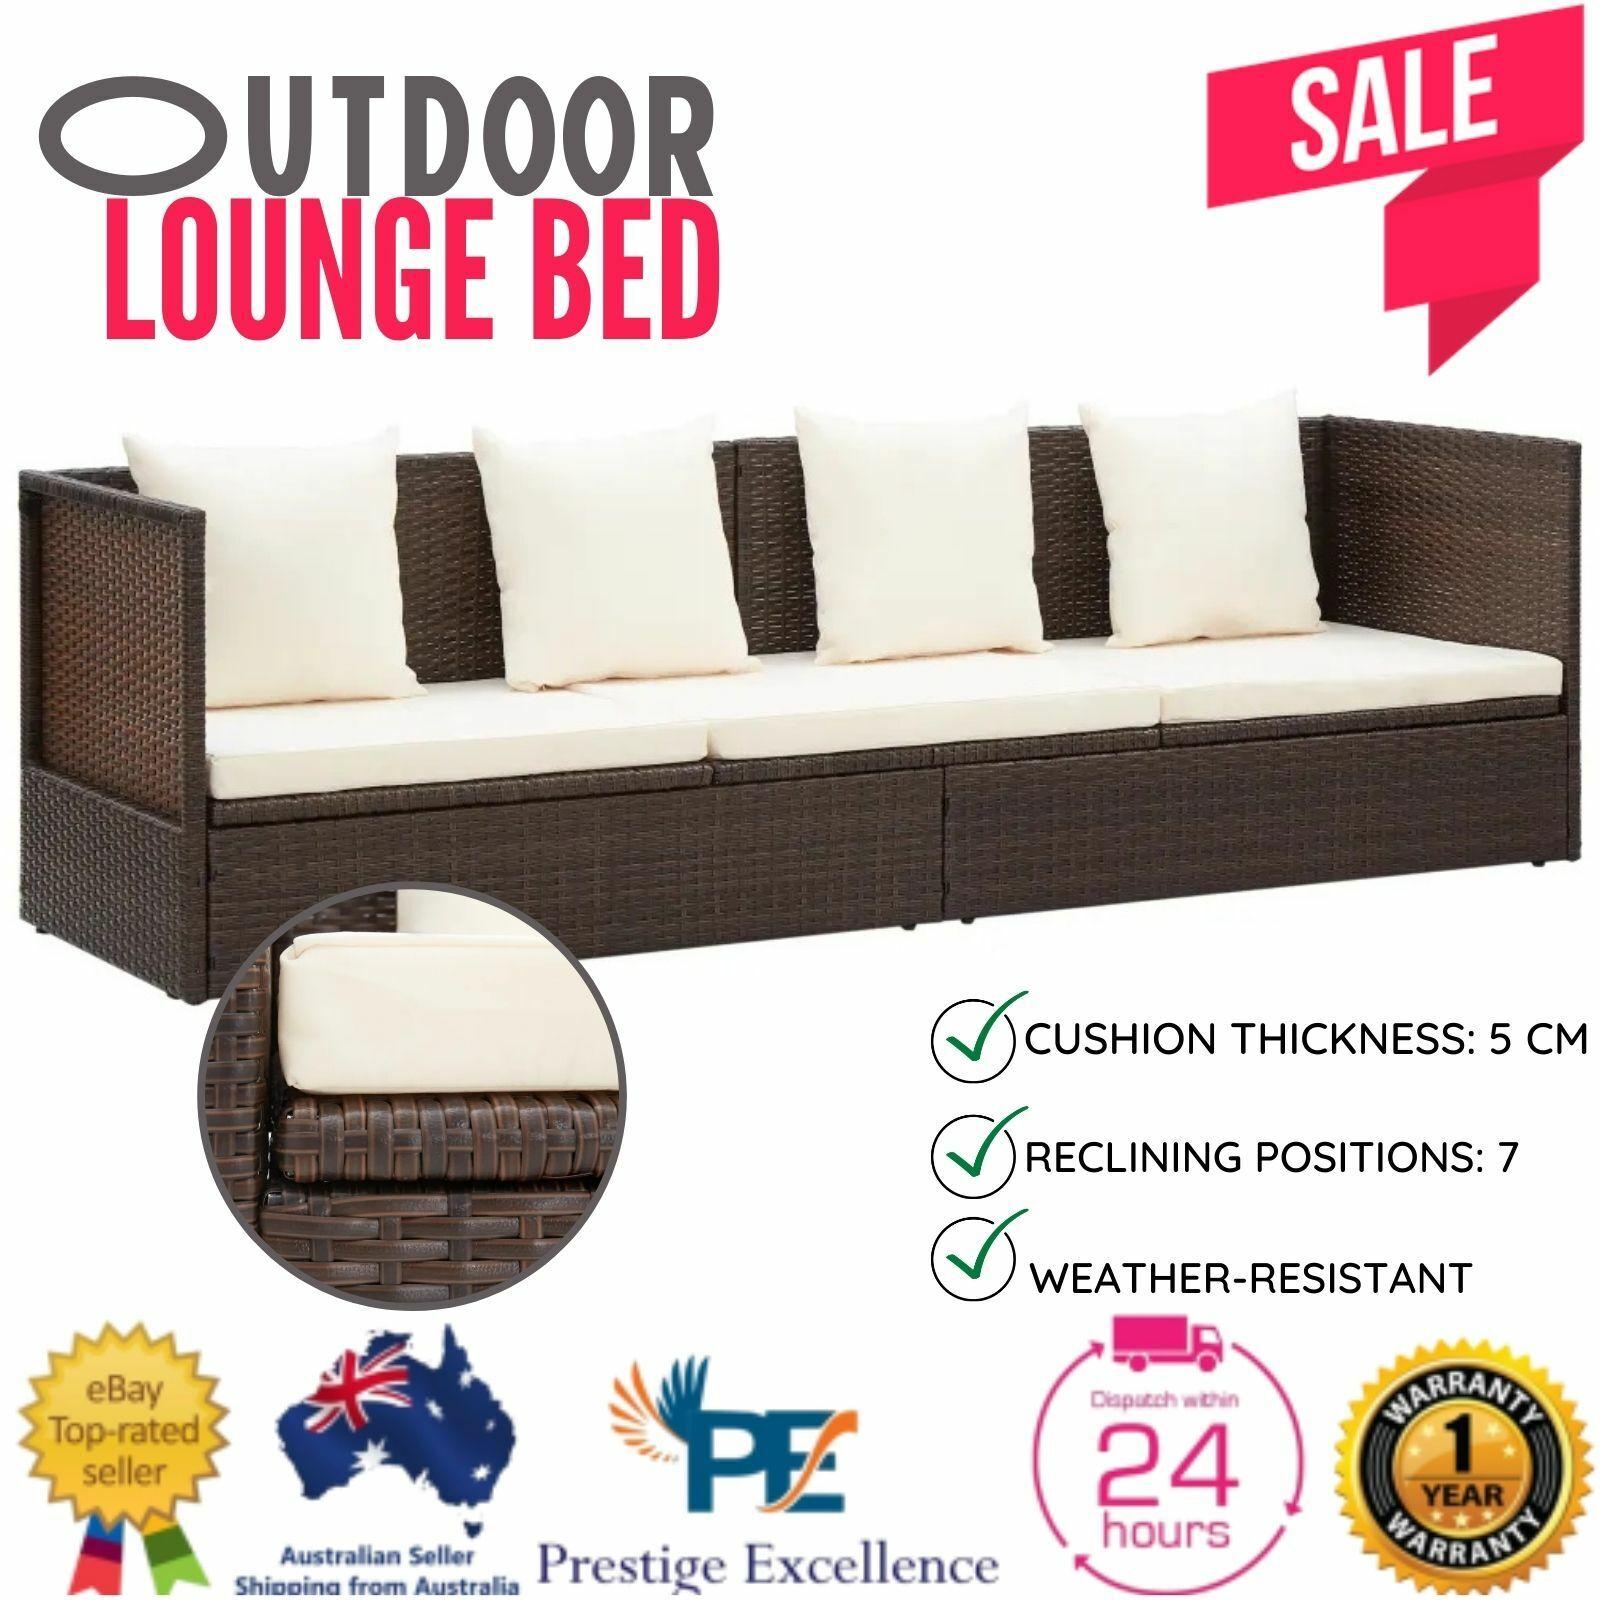 Garden Furniture - PE Wicker Day Bed Outdoor Furniture Lounge Patio Sofa Garden Setting w/ Cushion